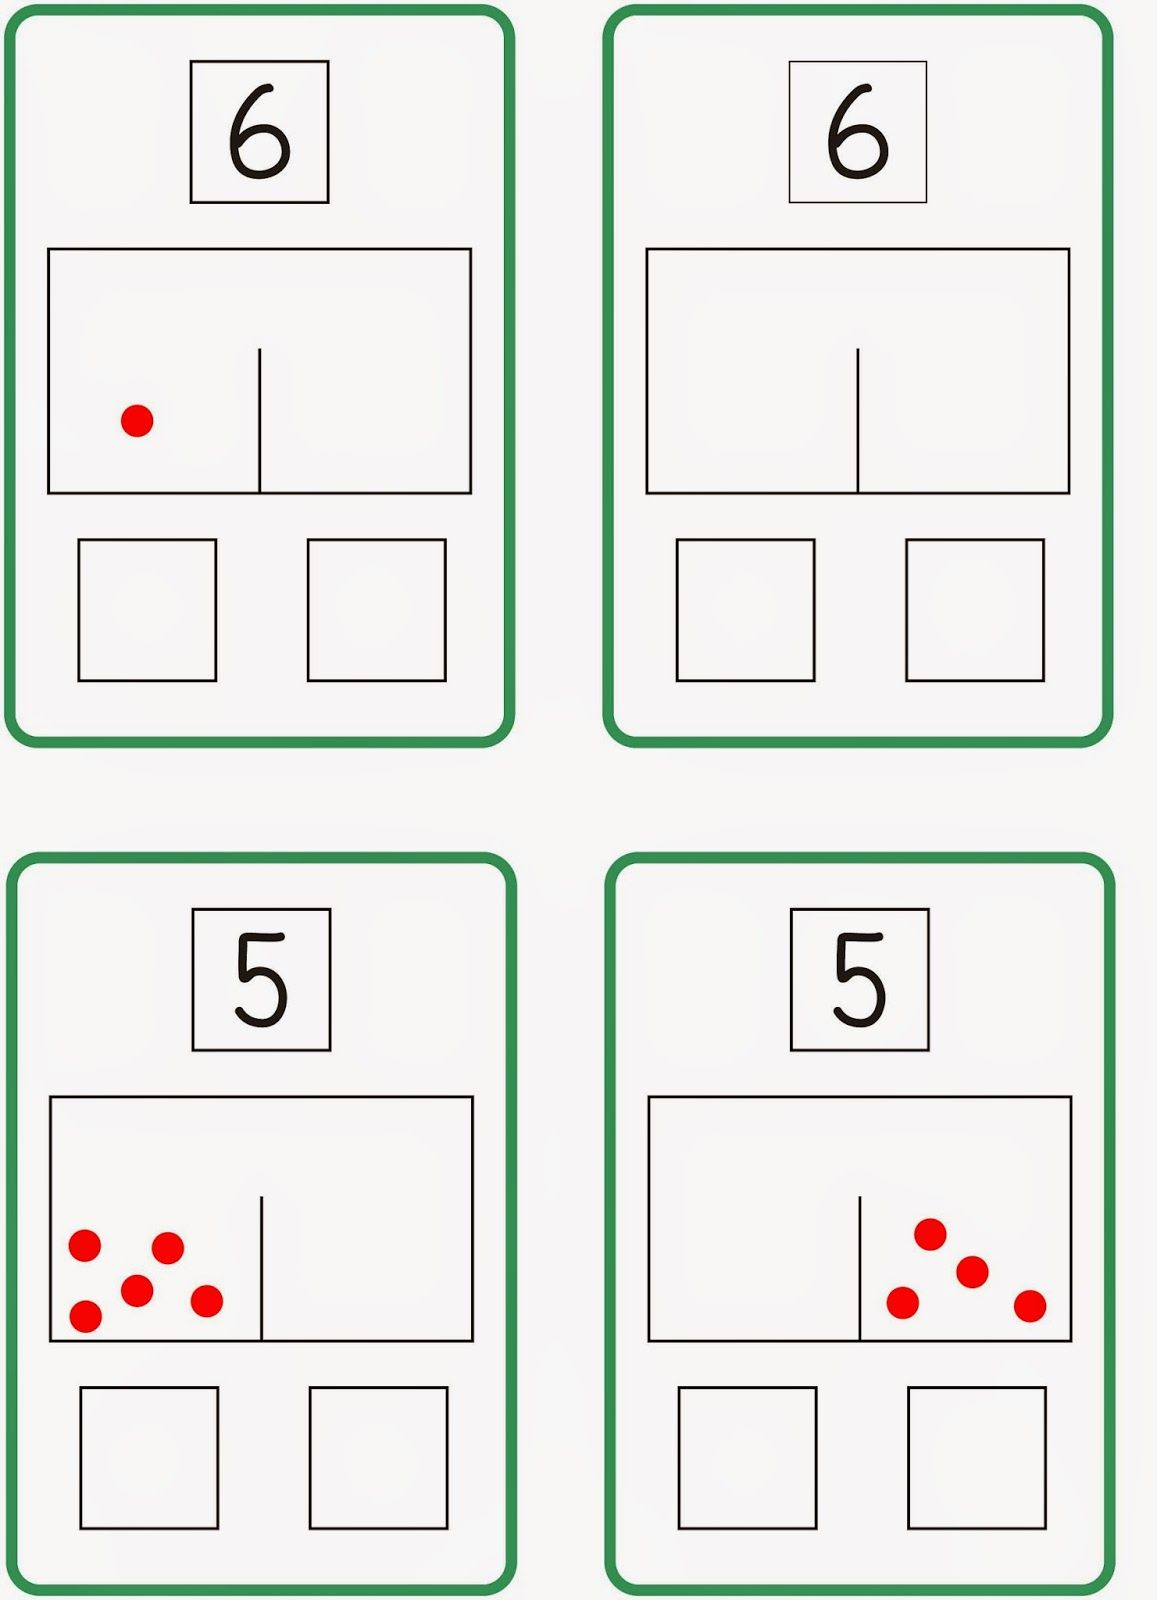 zahlzerlegung sch ttelbox 2 mathe pinterest mathe matheunterricht und mathematik lernen. Black Bedroom Furniture Sets. Home Design Ideas